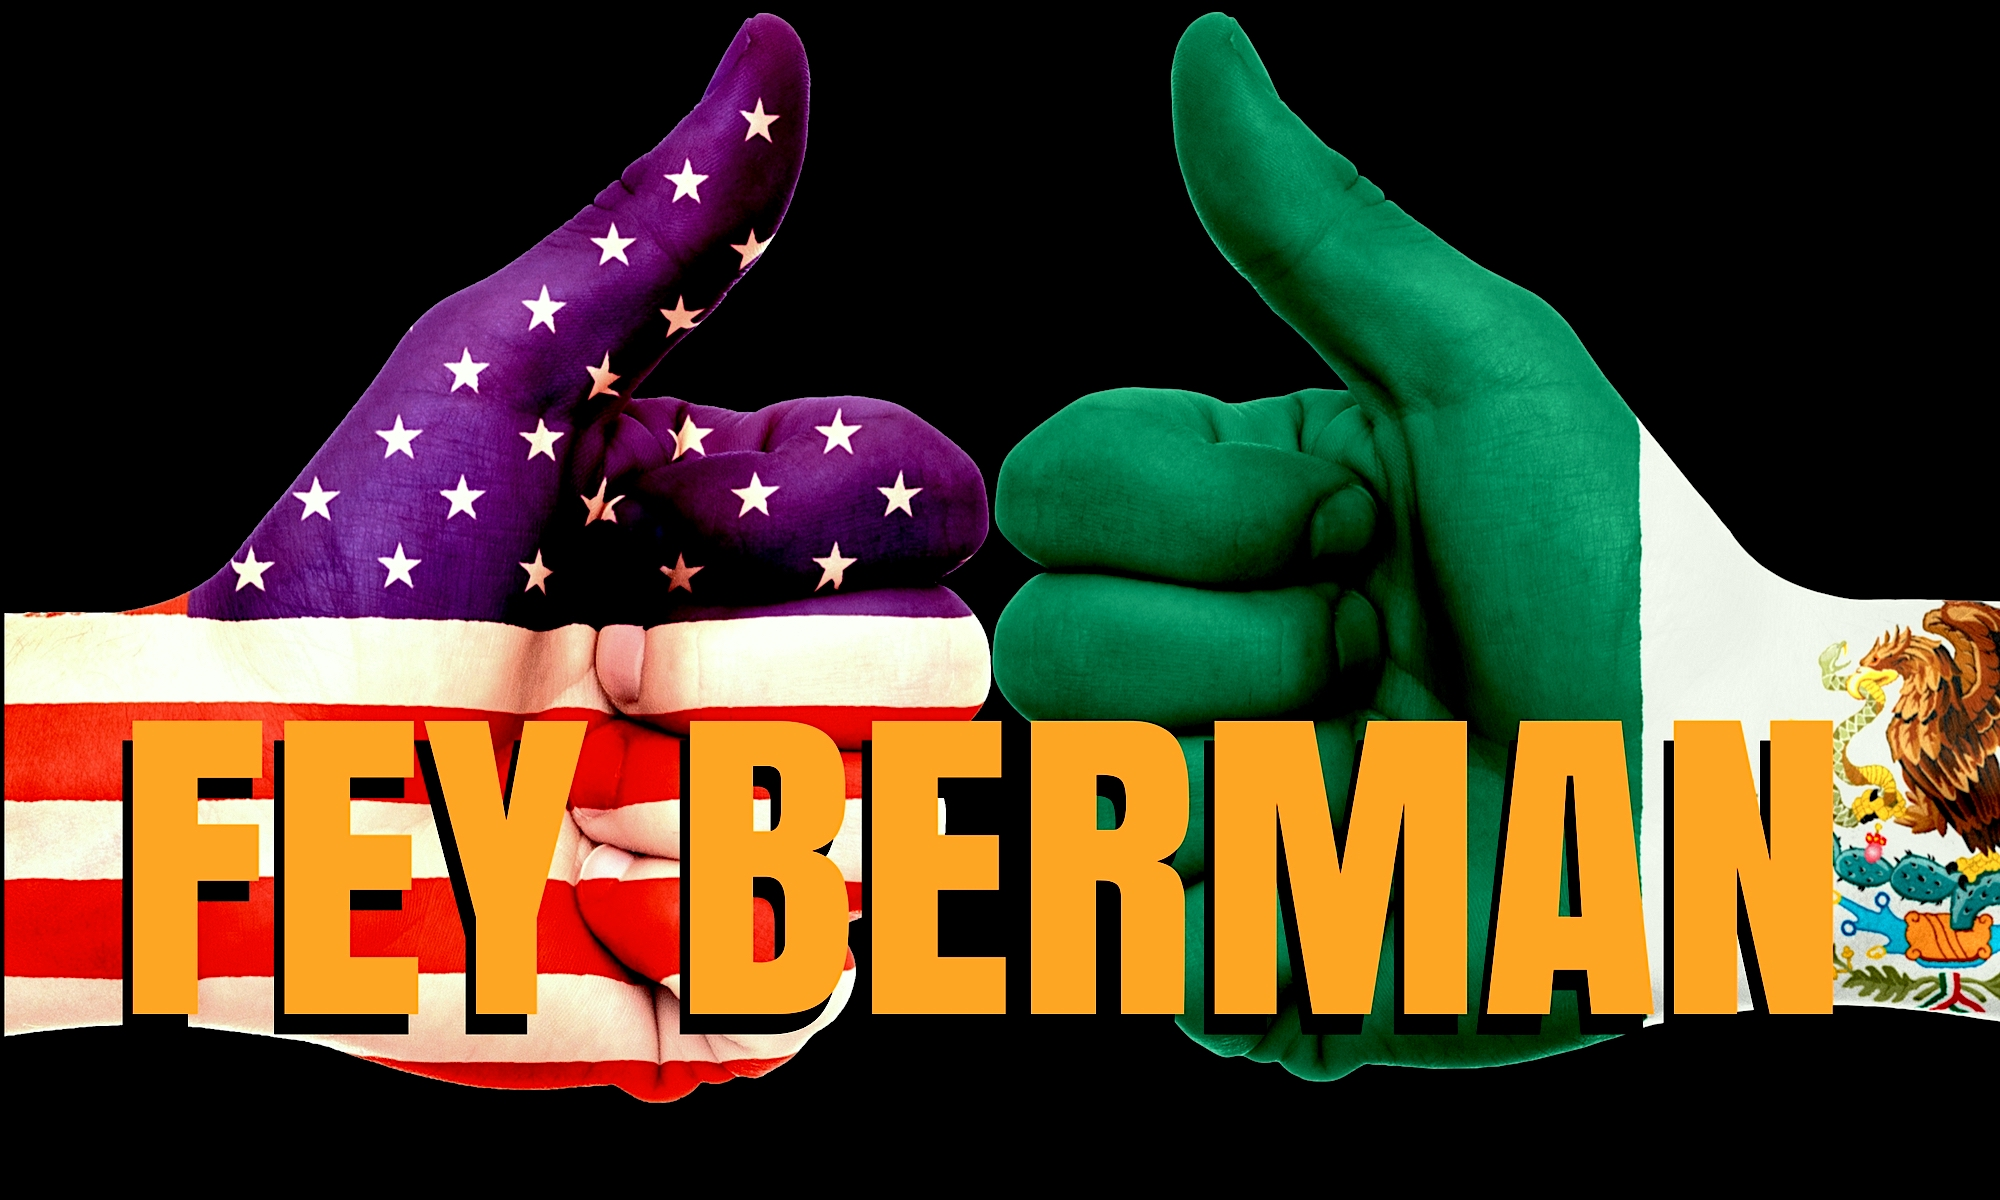 Fey Berman